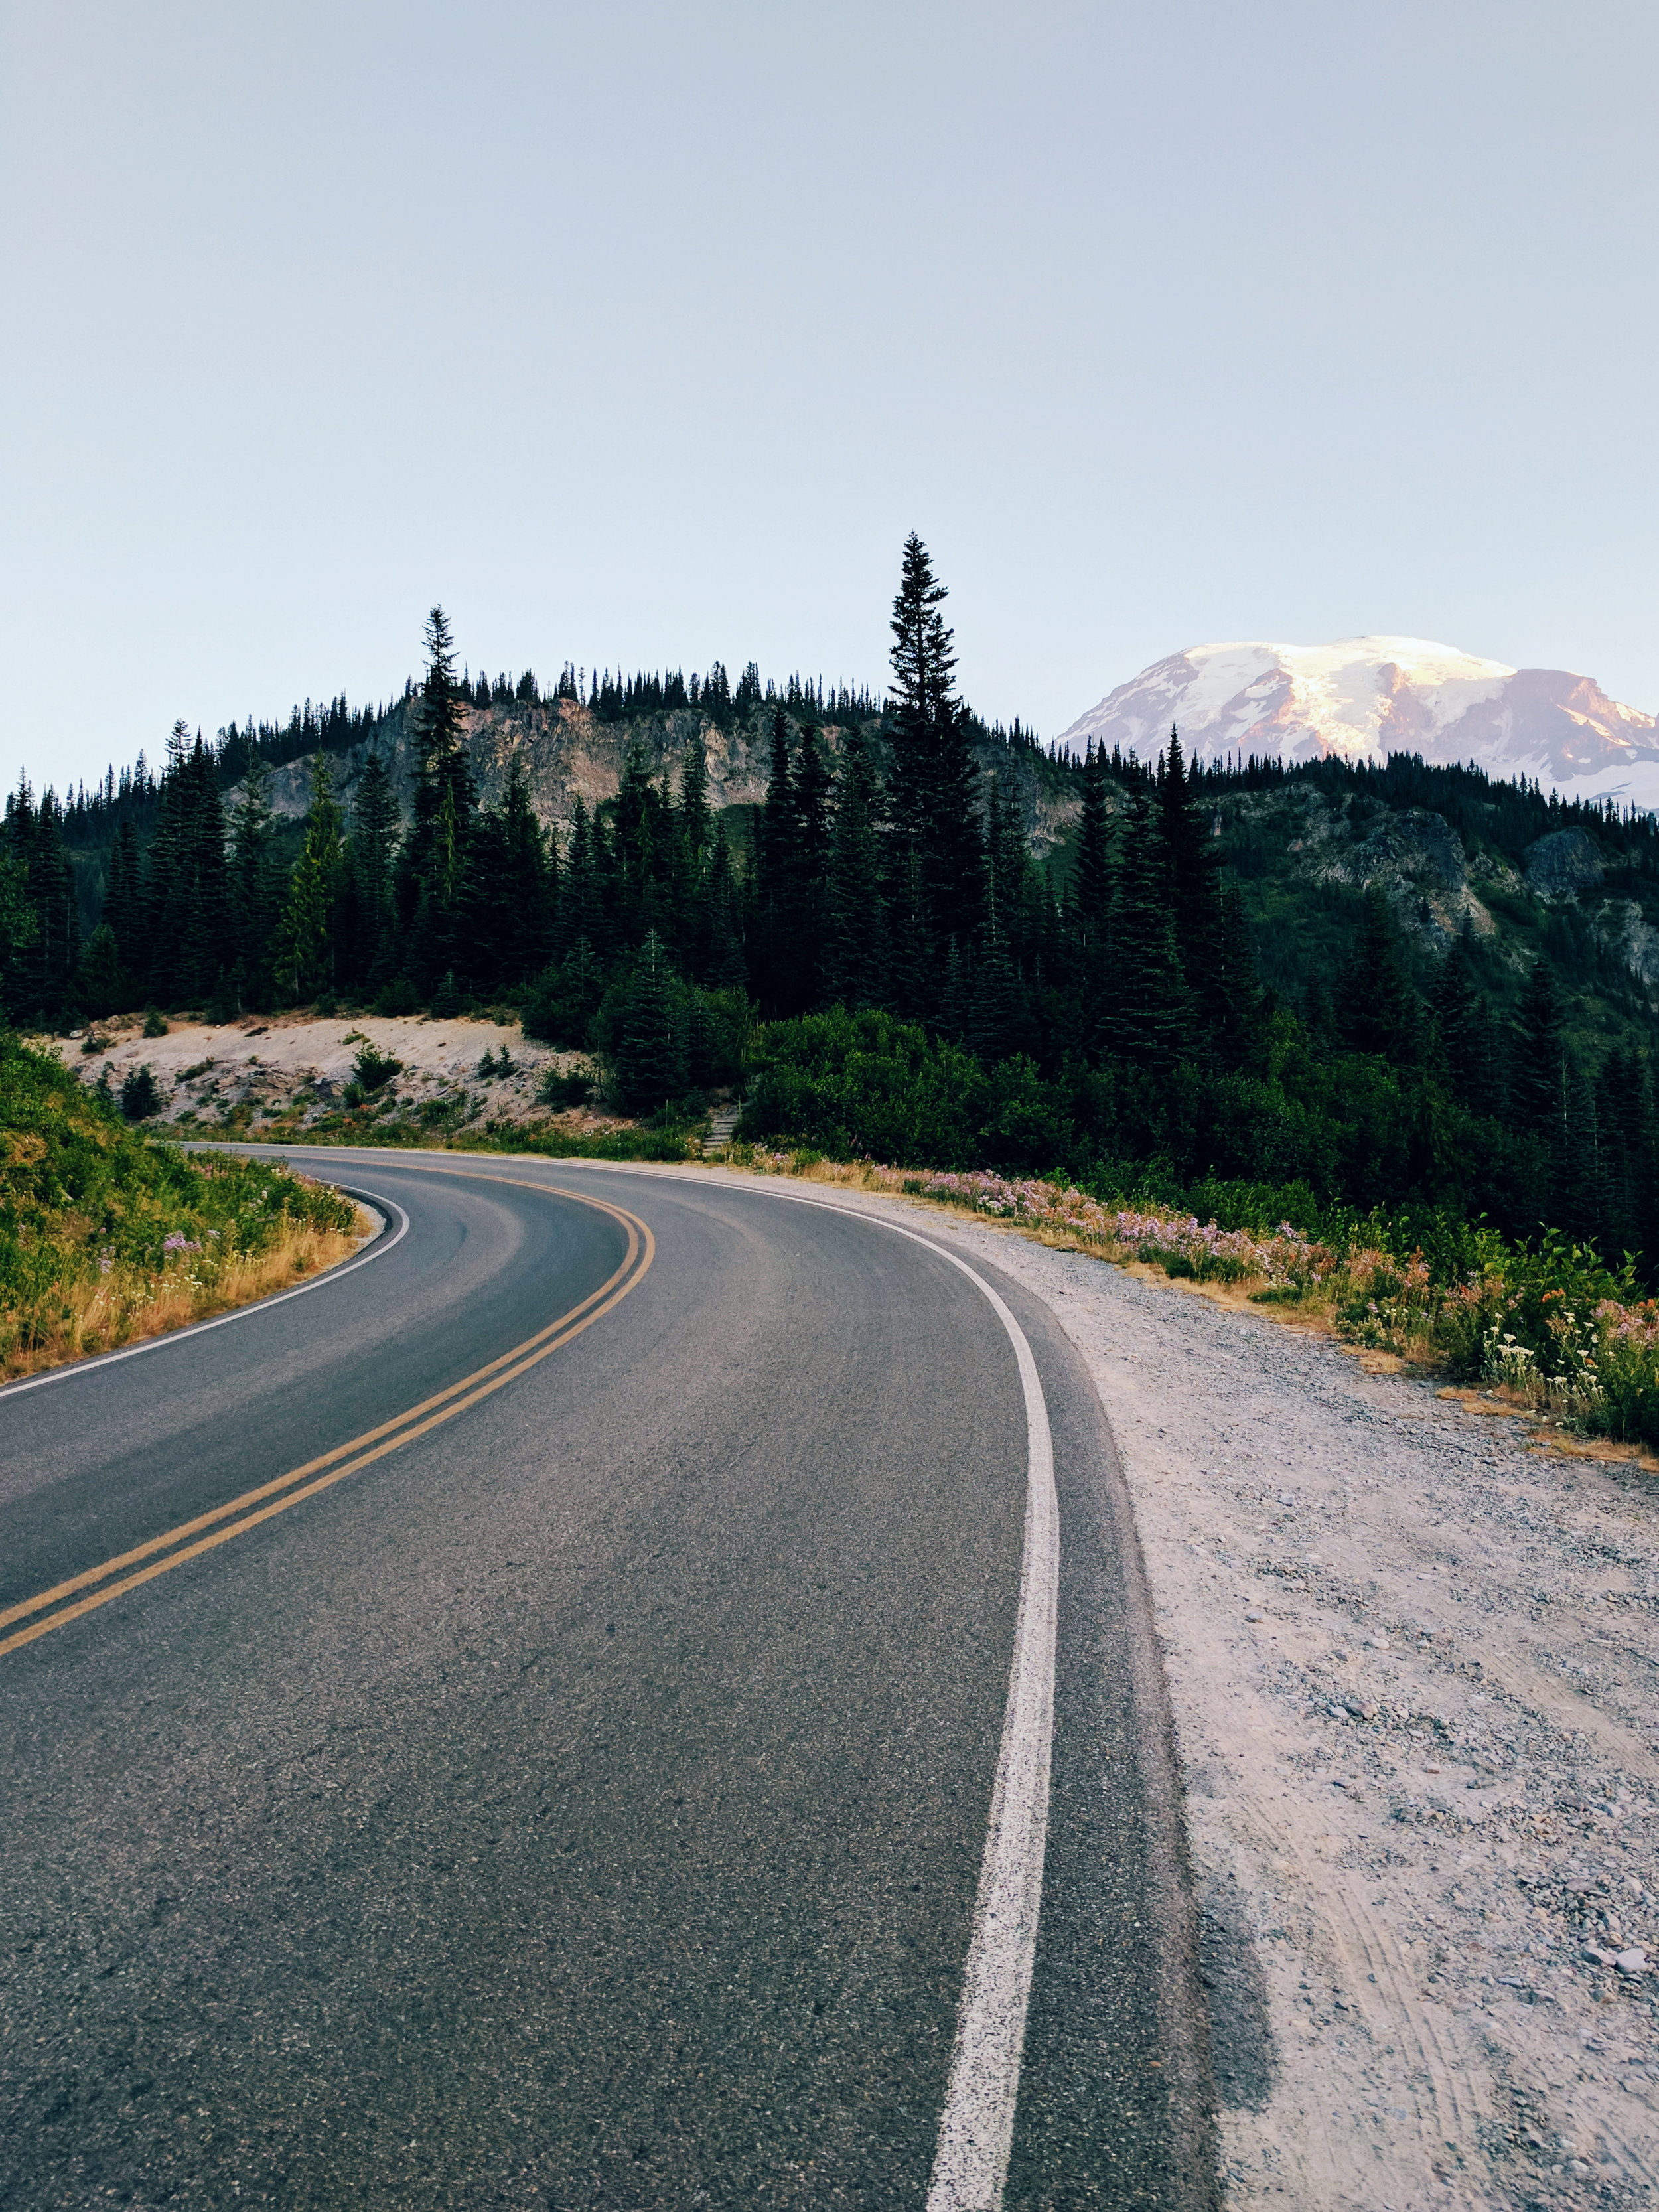 Road to Mt. Rainier